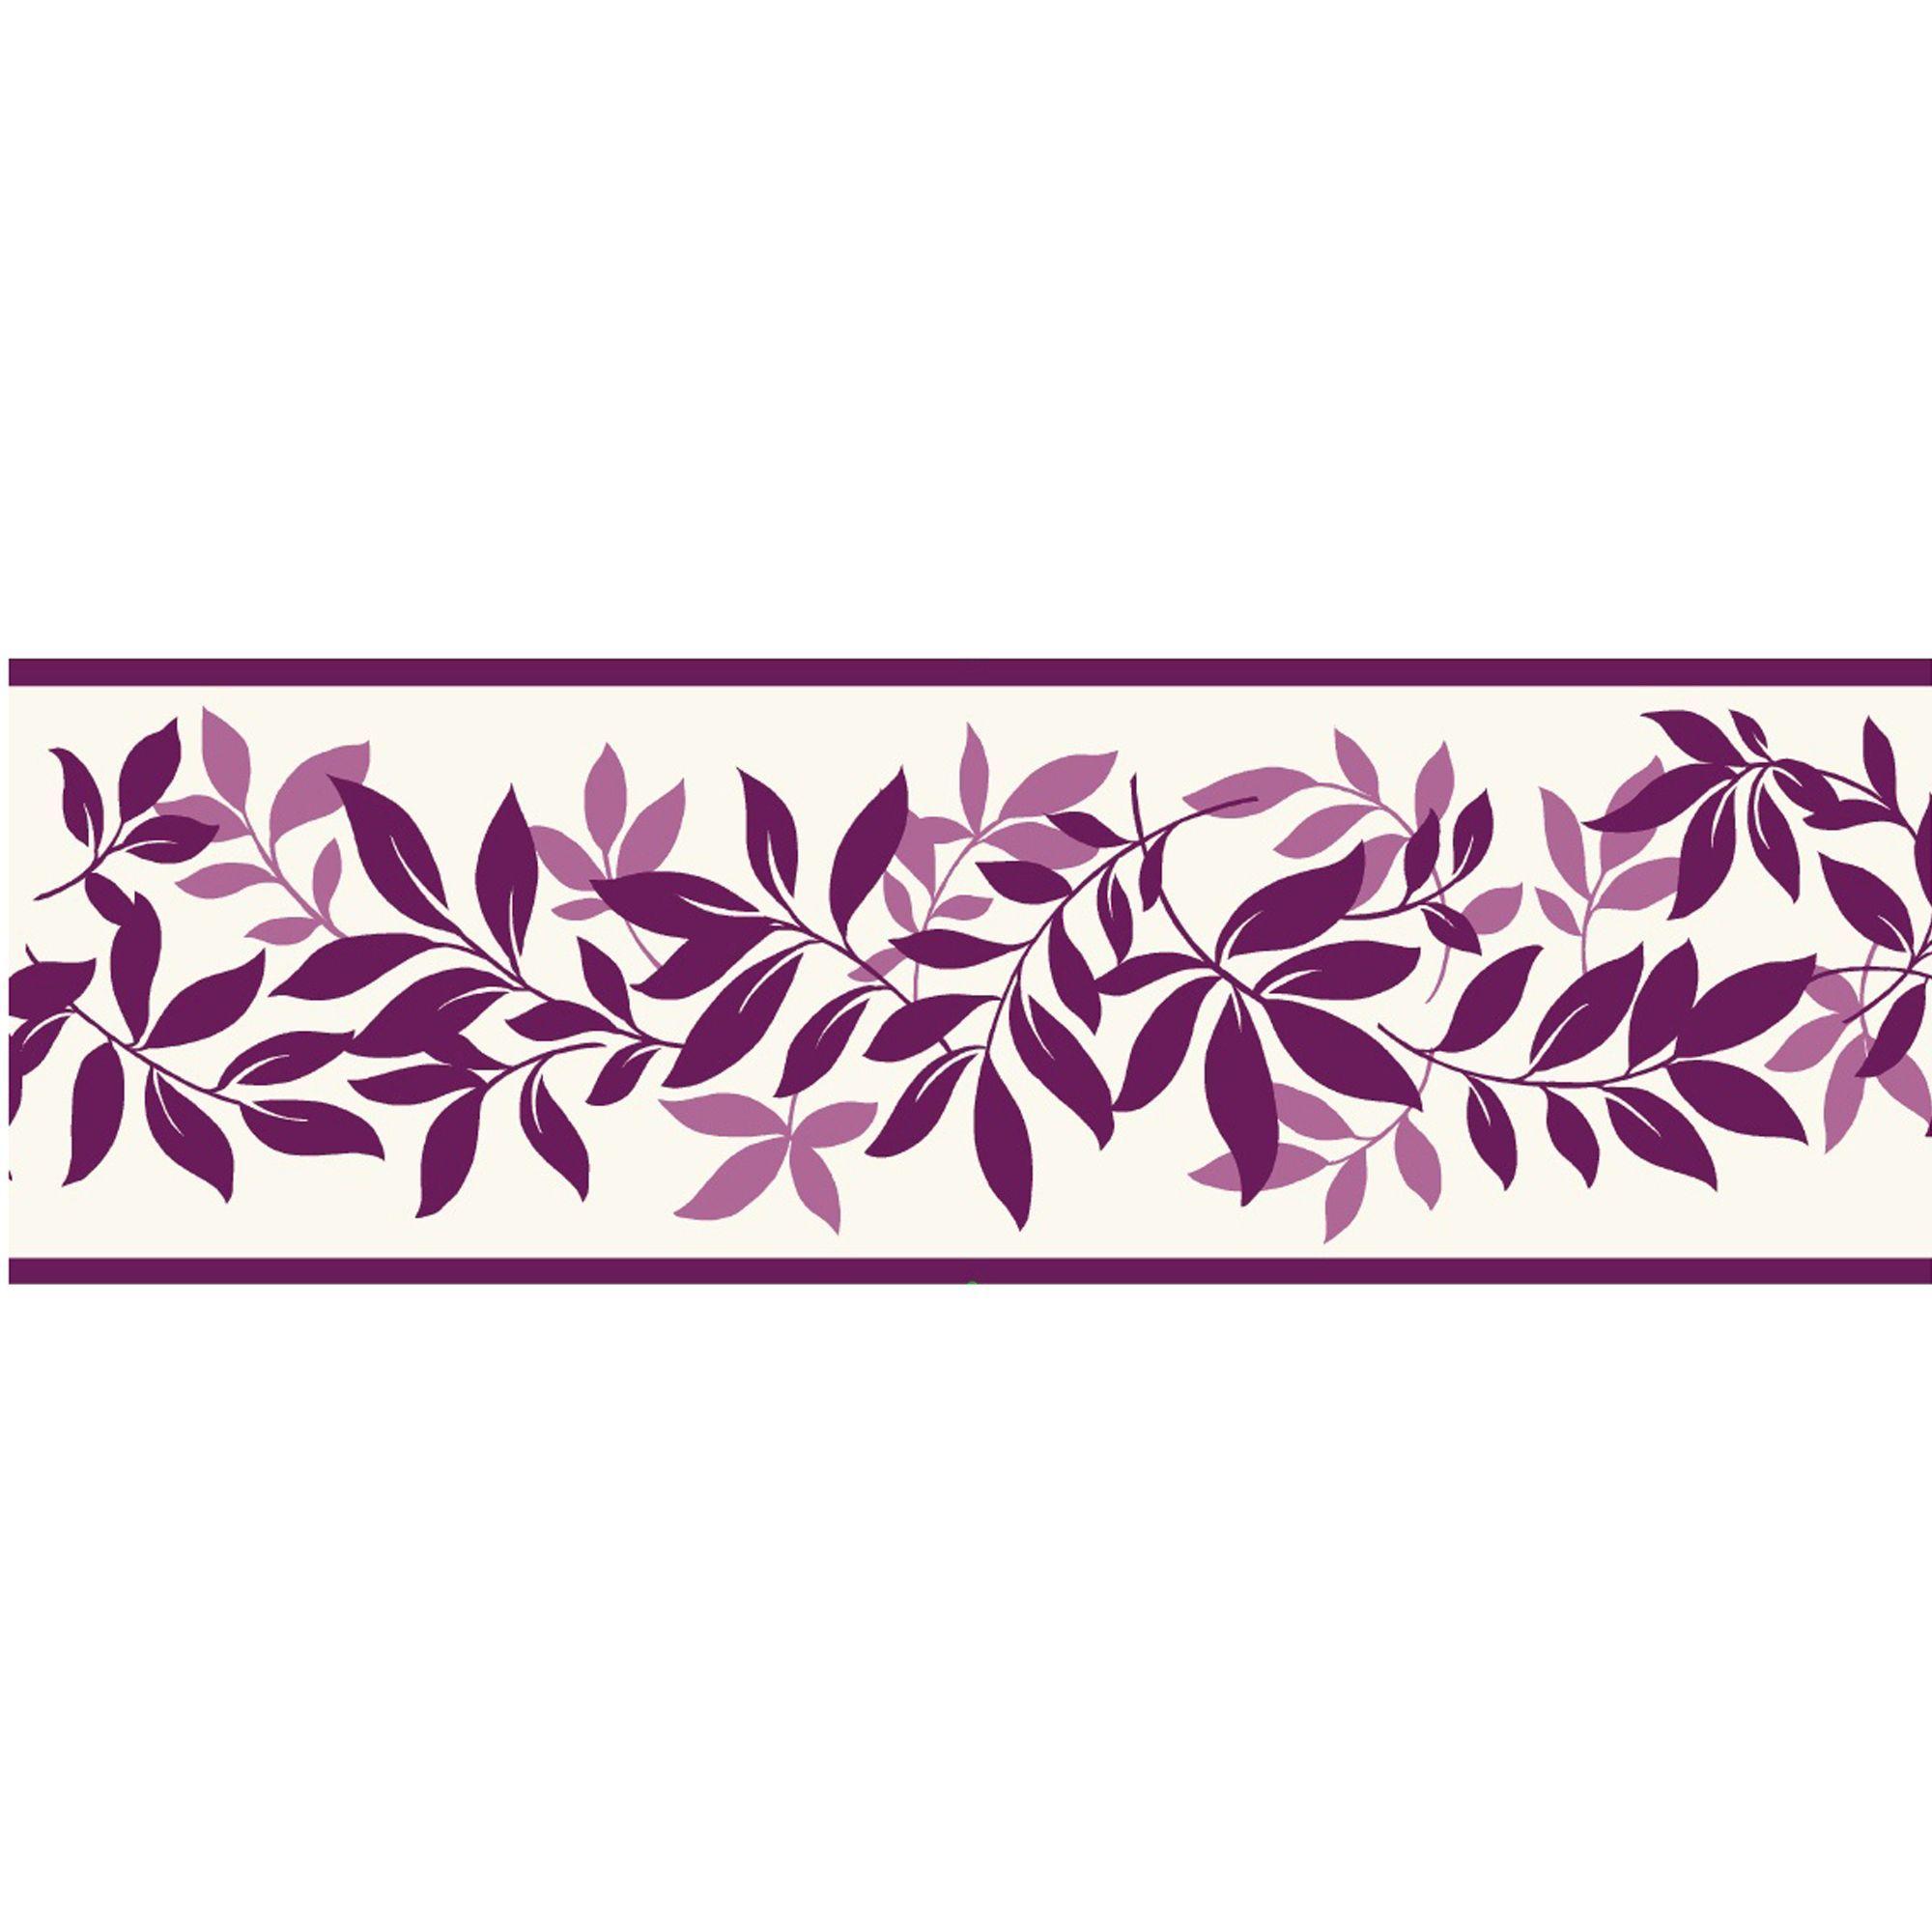 Leaf Trail Plum Border Departments Diy At B Q Modern Floral B Q Wallpaper Border